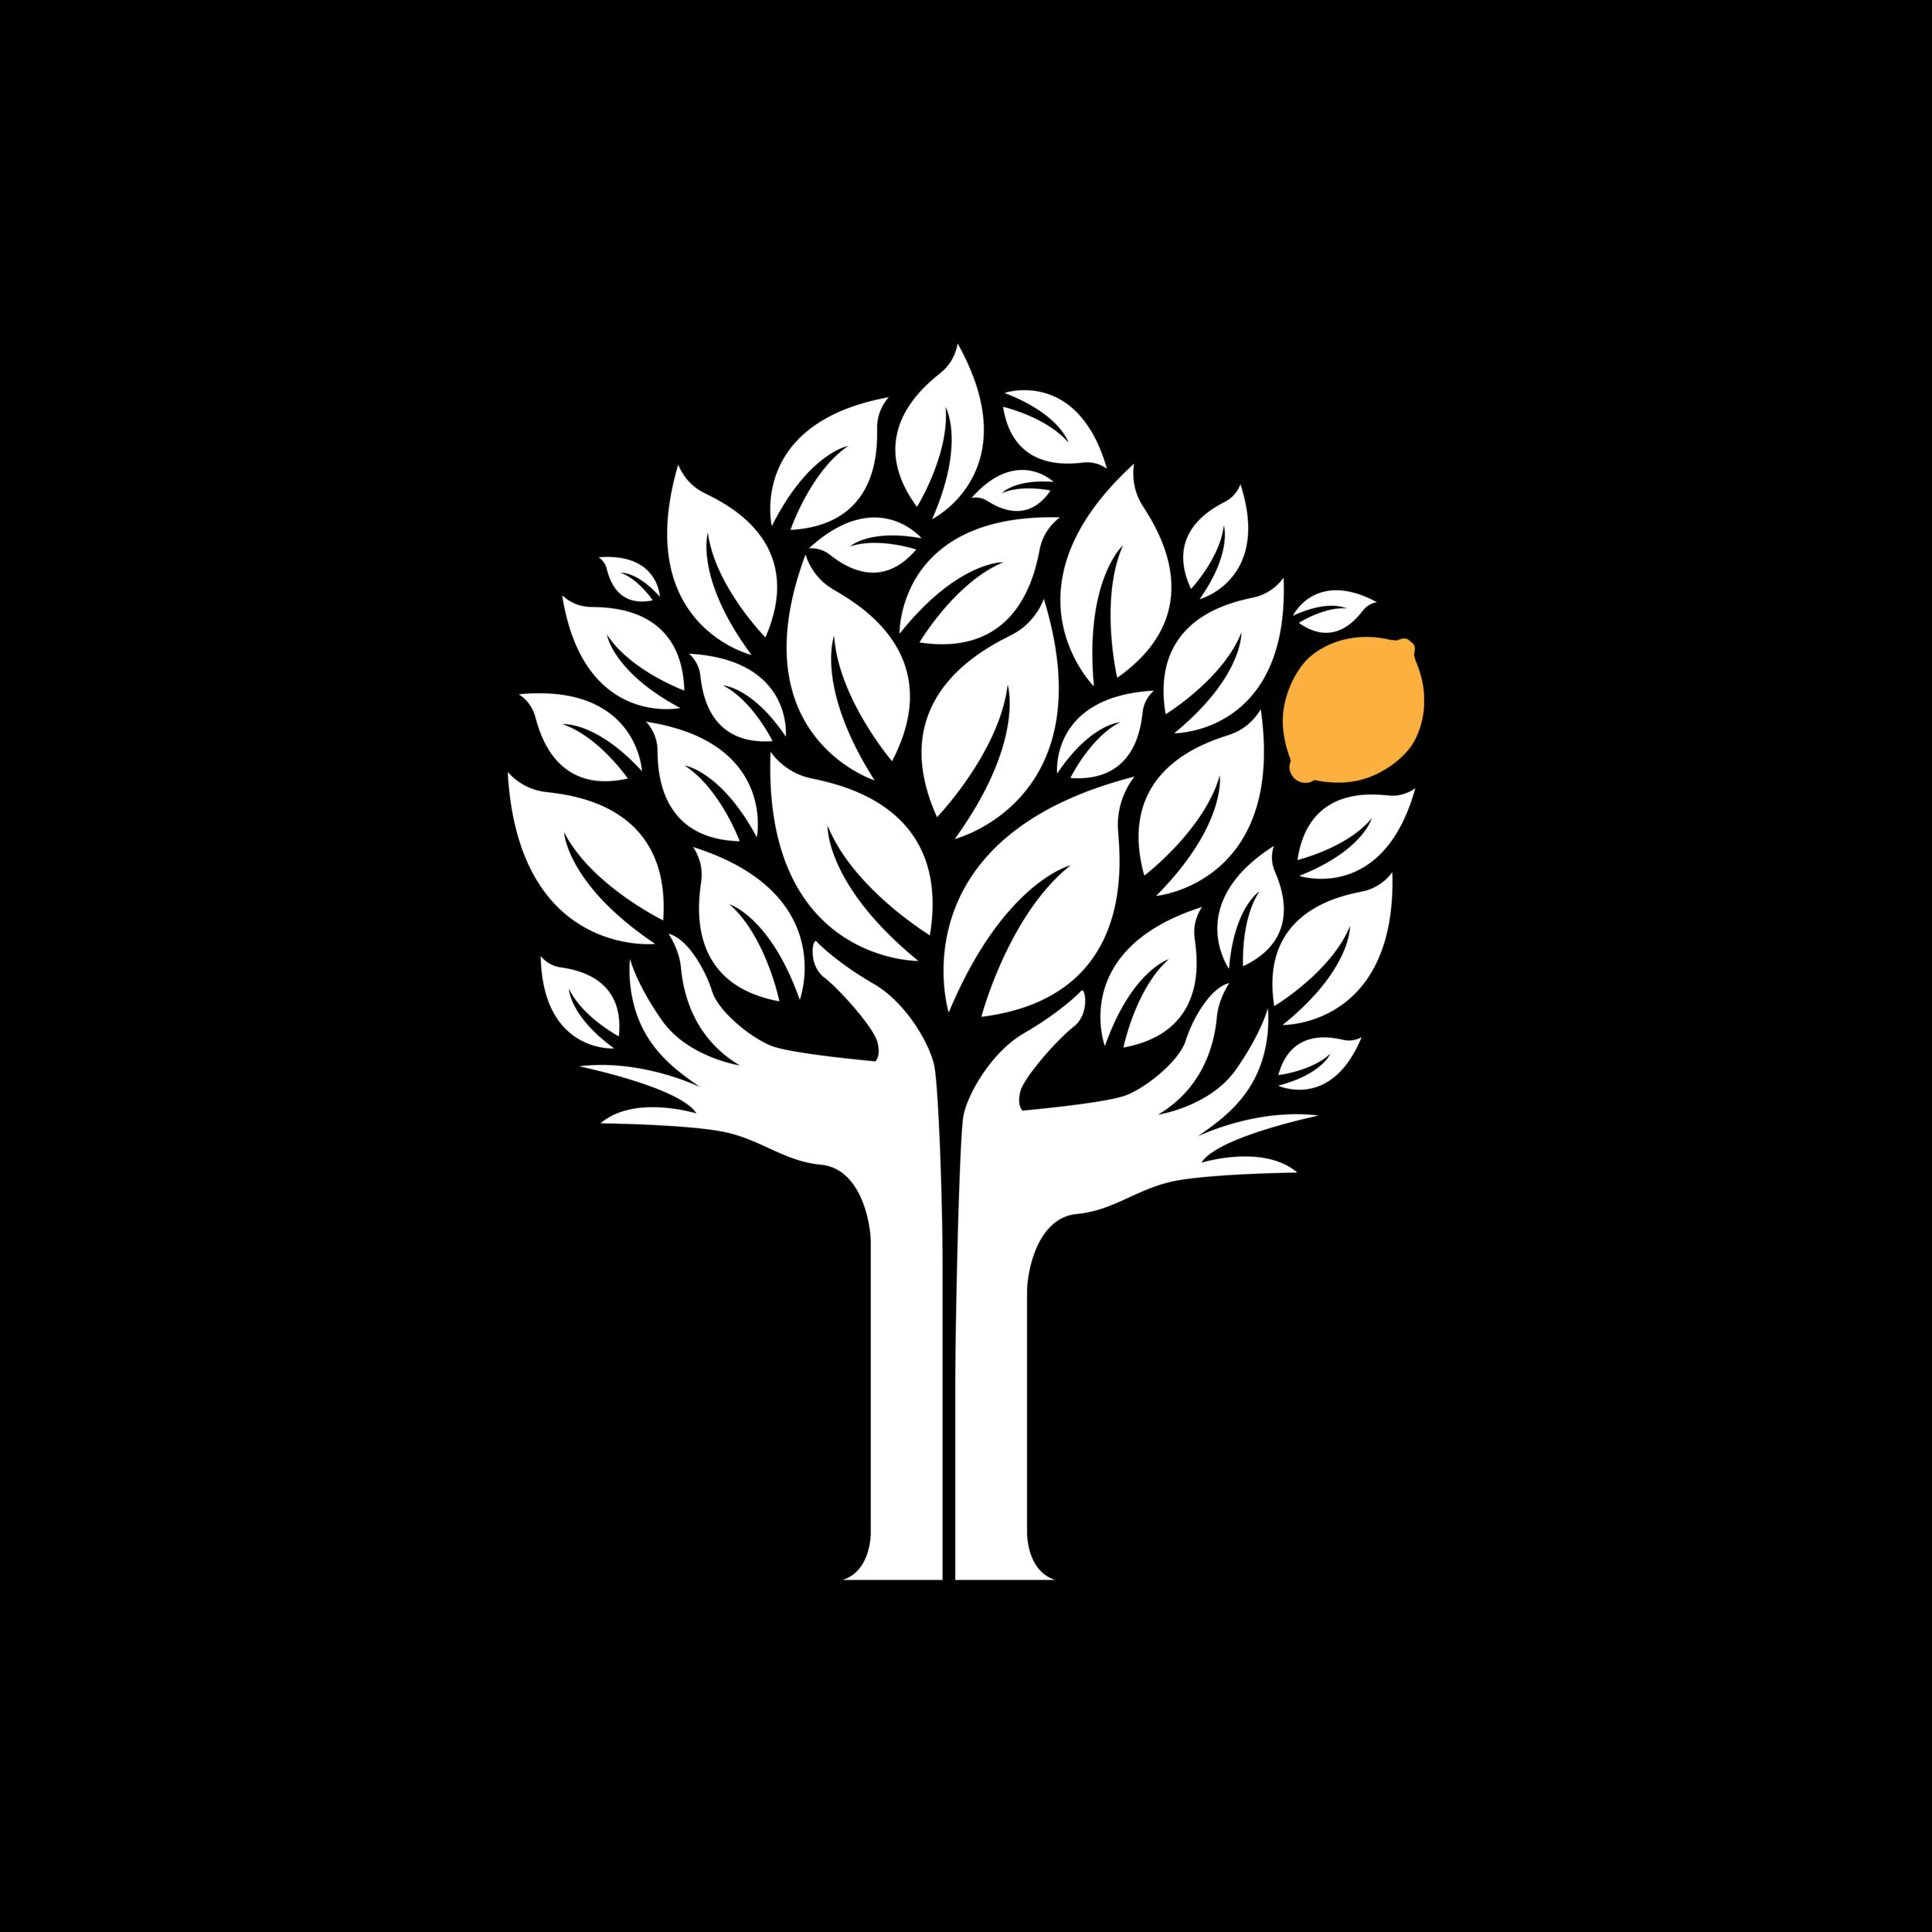 The FMK Foundation - thefmkfoundation.org